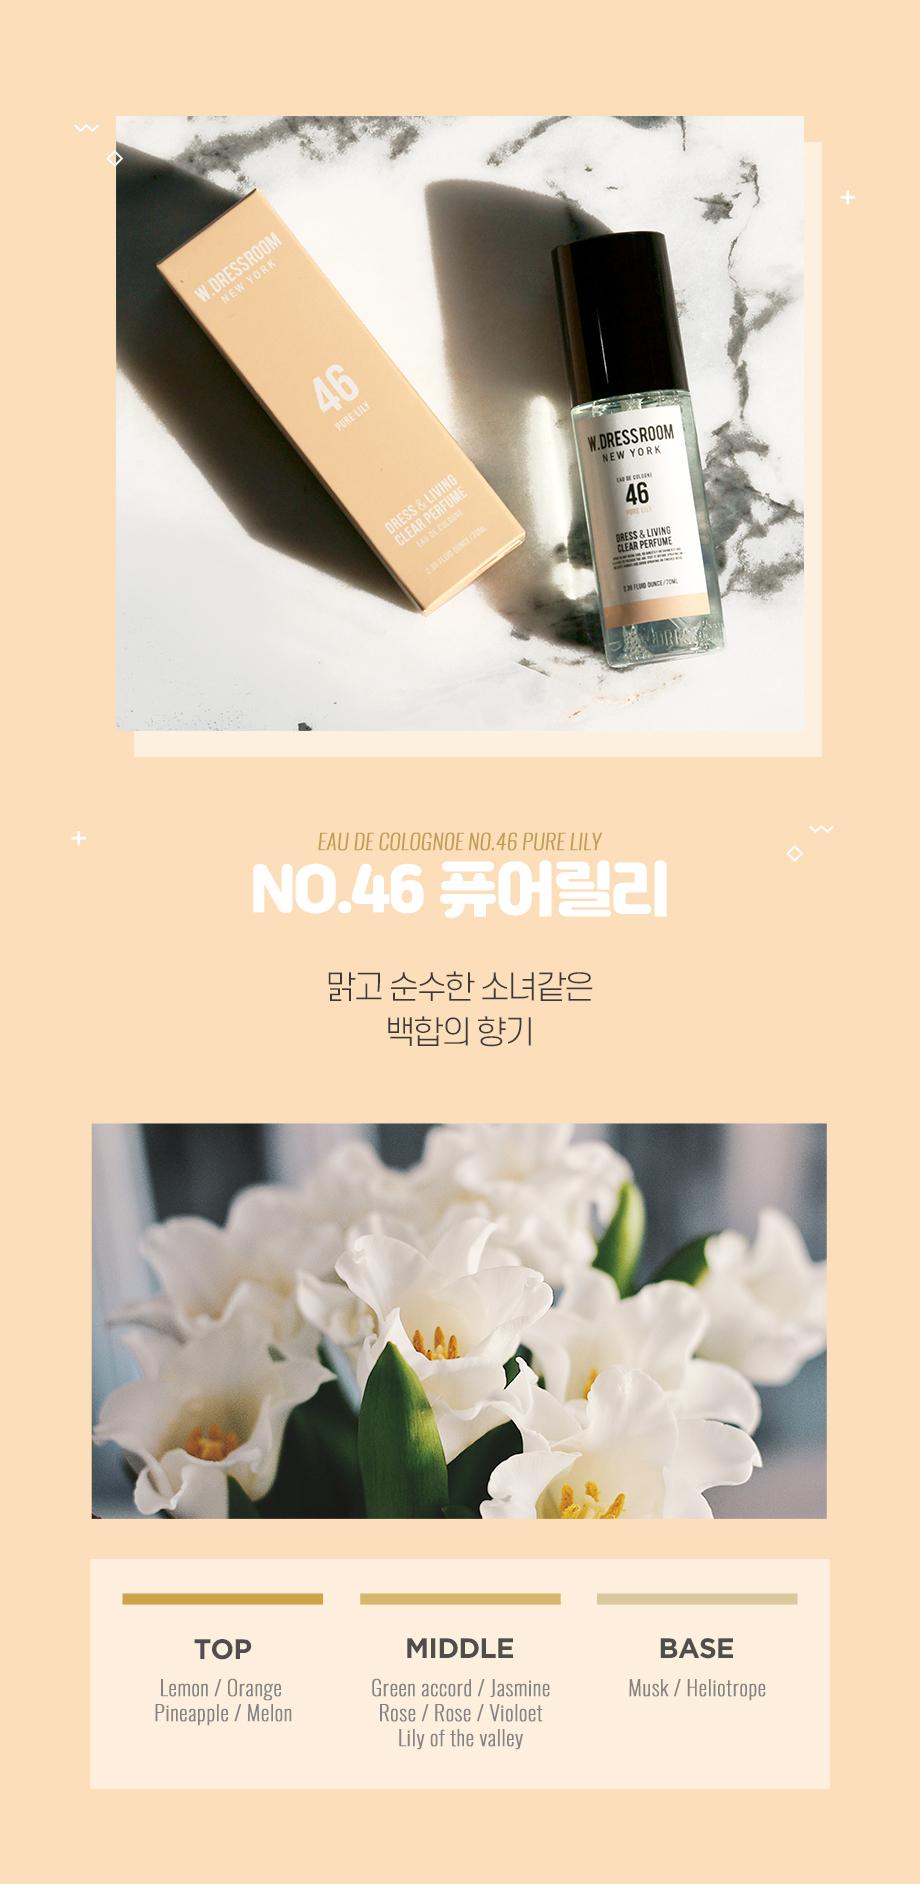 dressperfume